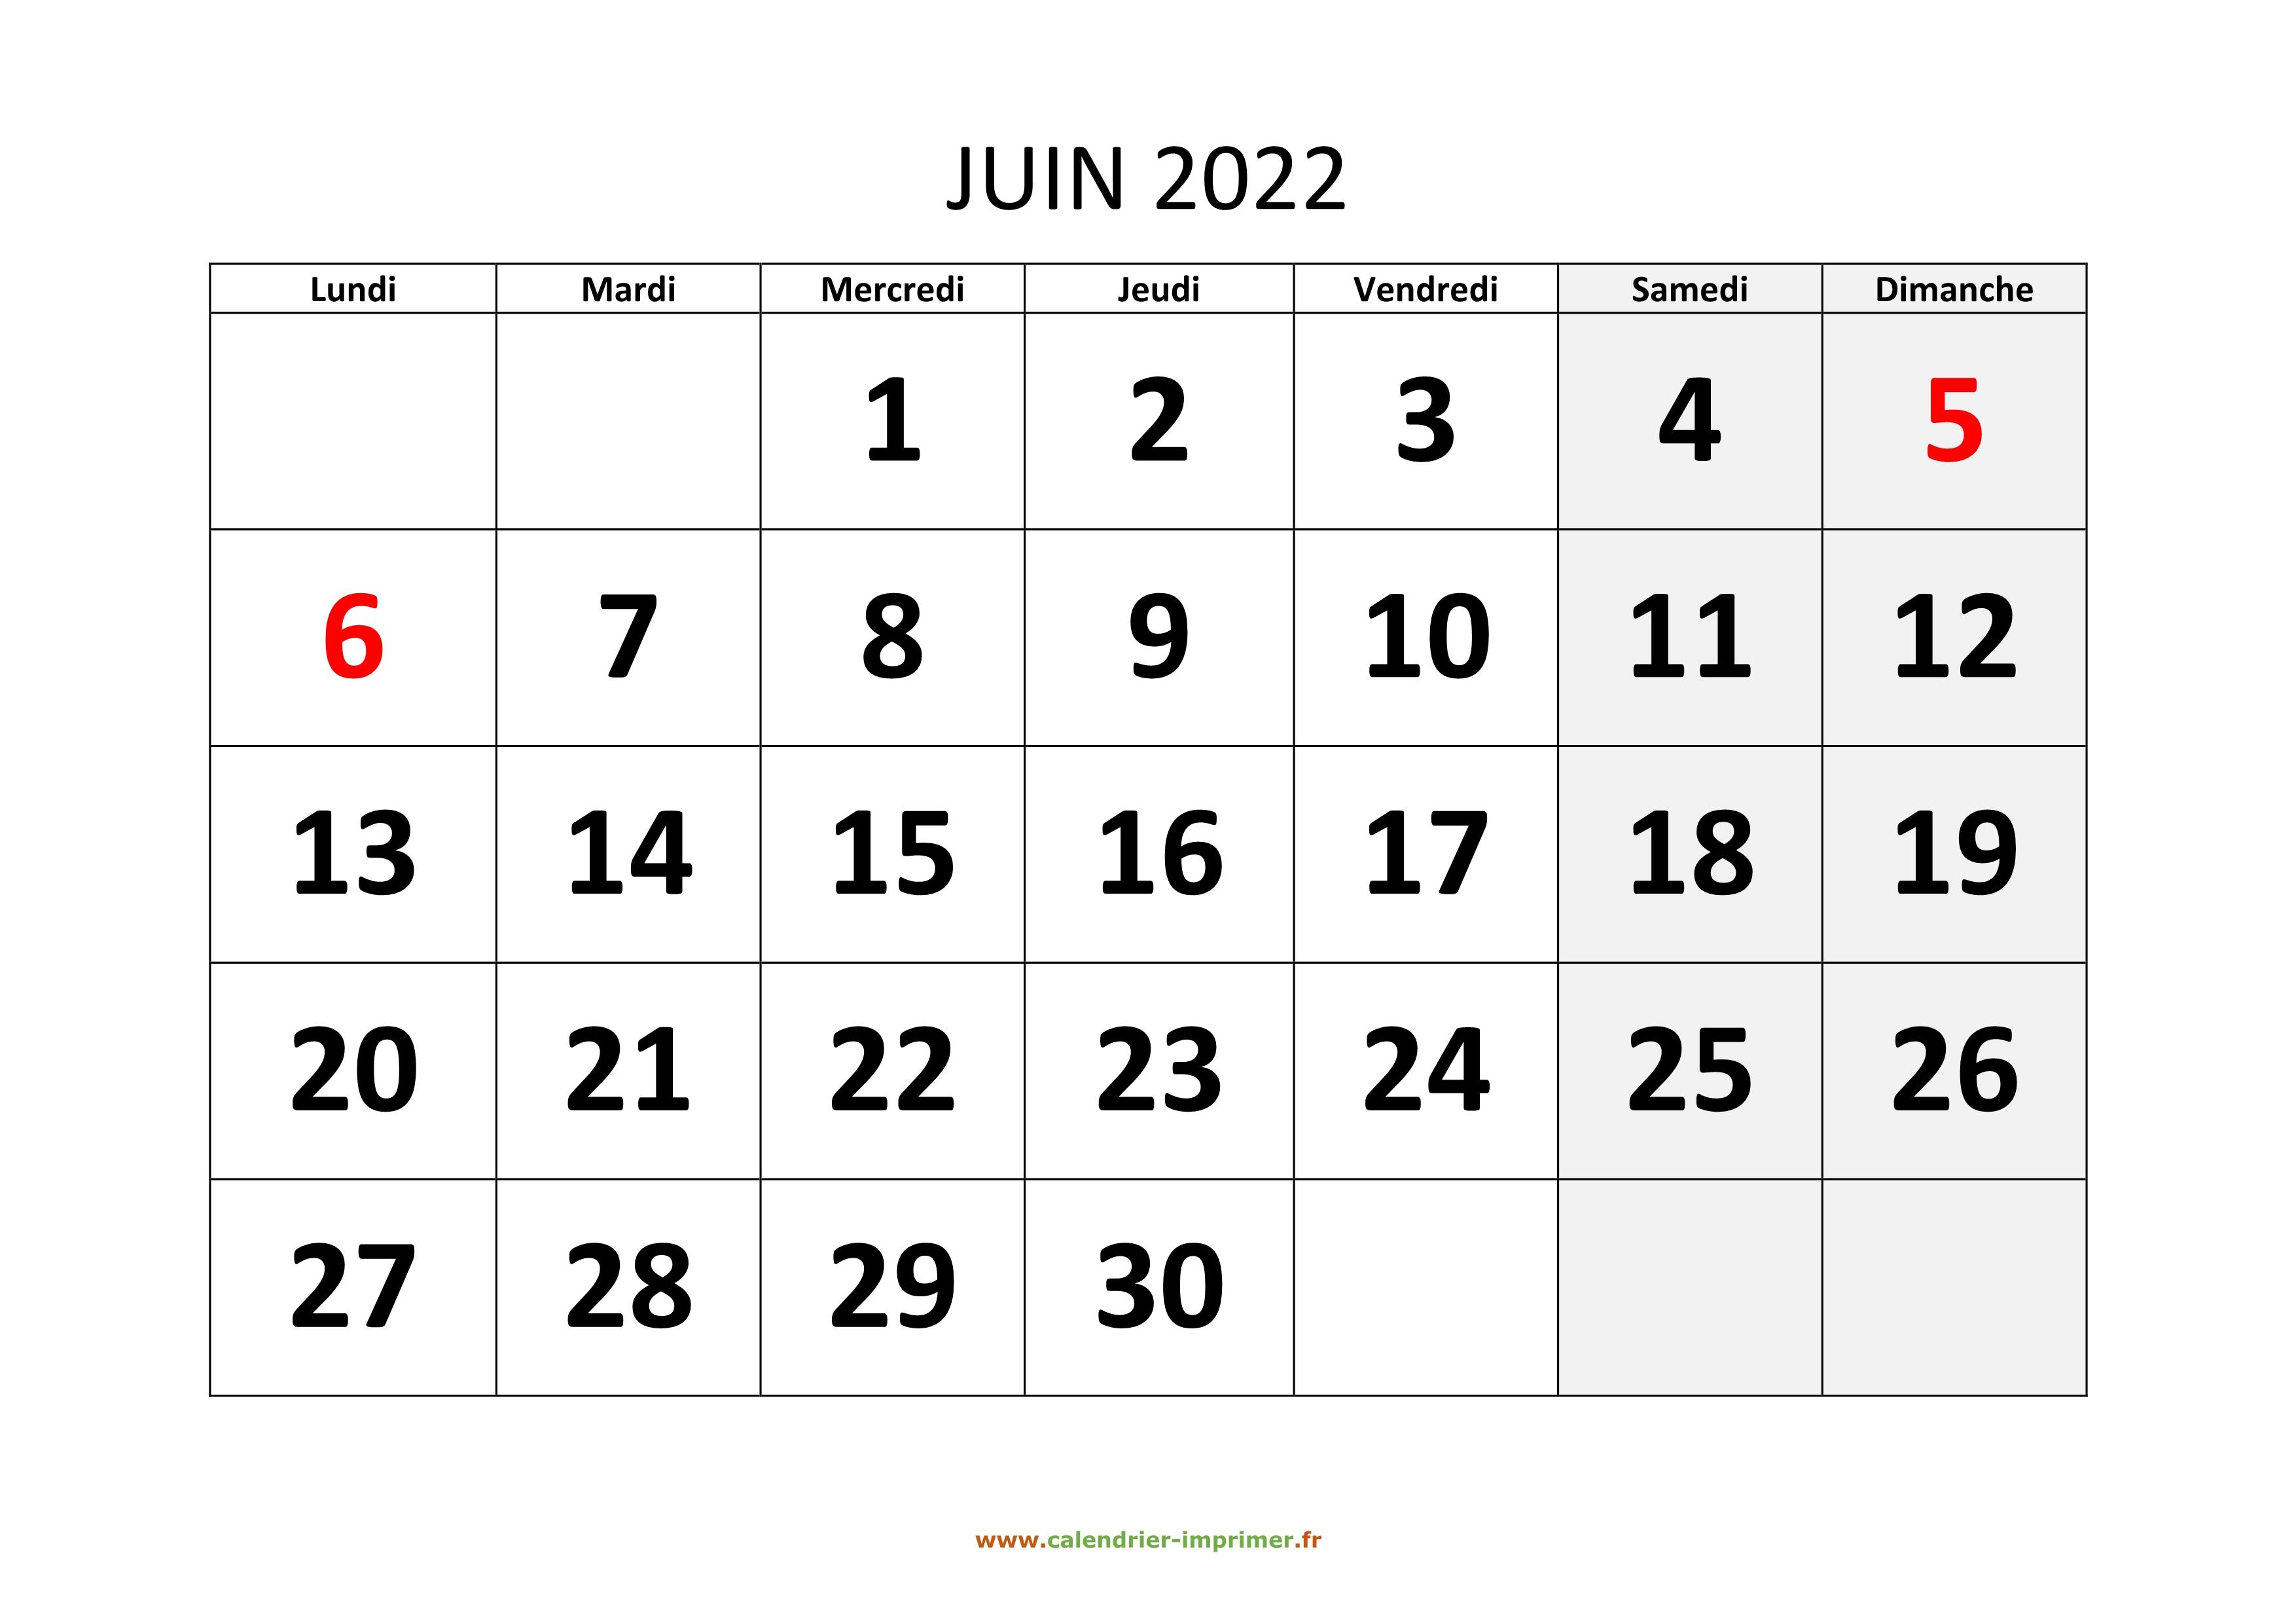 Calendrier Juin 2022 A Imprimer Calendrier Juin 2022 à imprimer